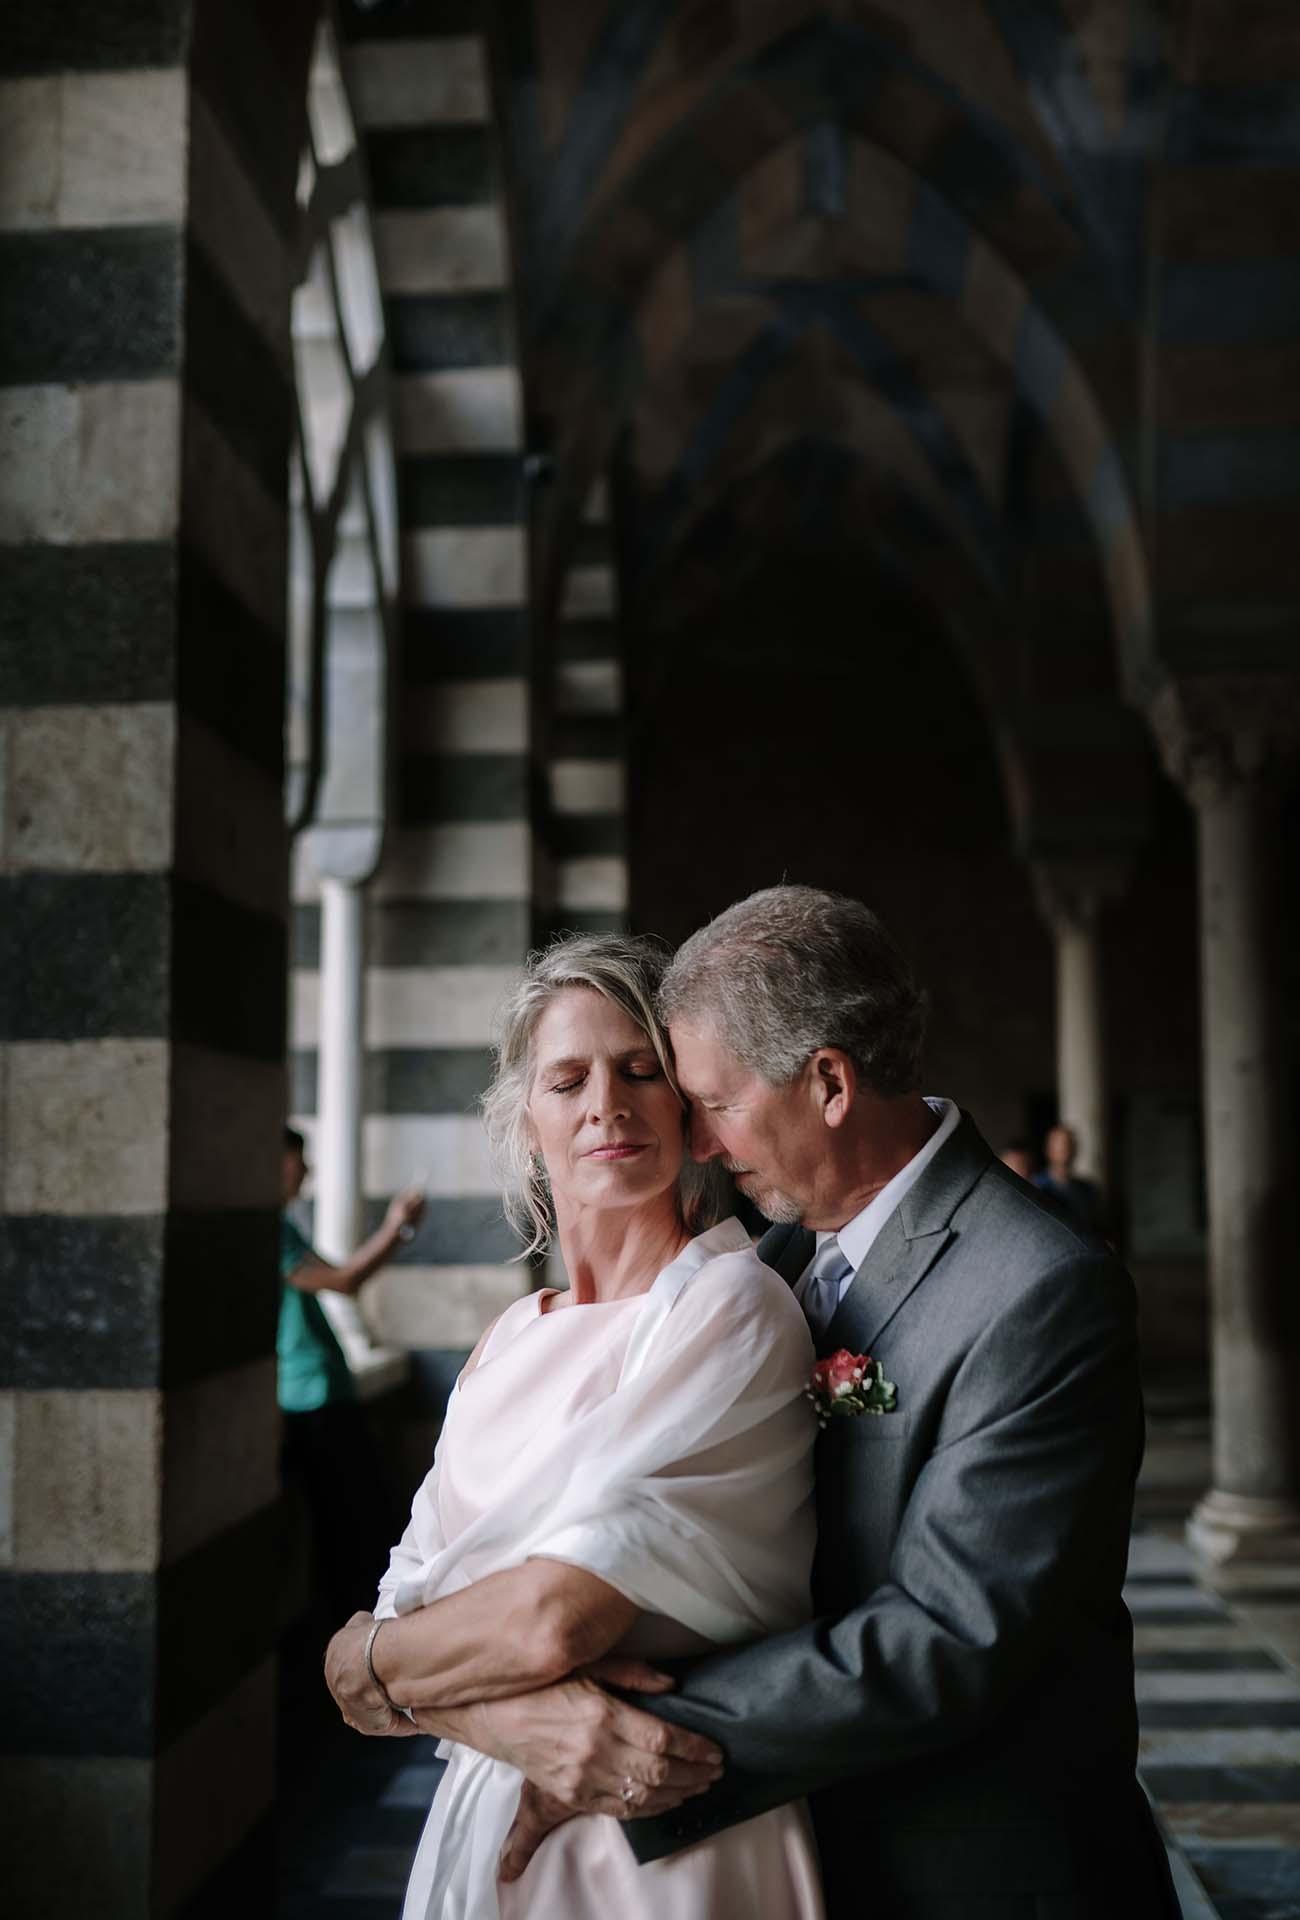 matrimonio costiera amalfitana (4)